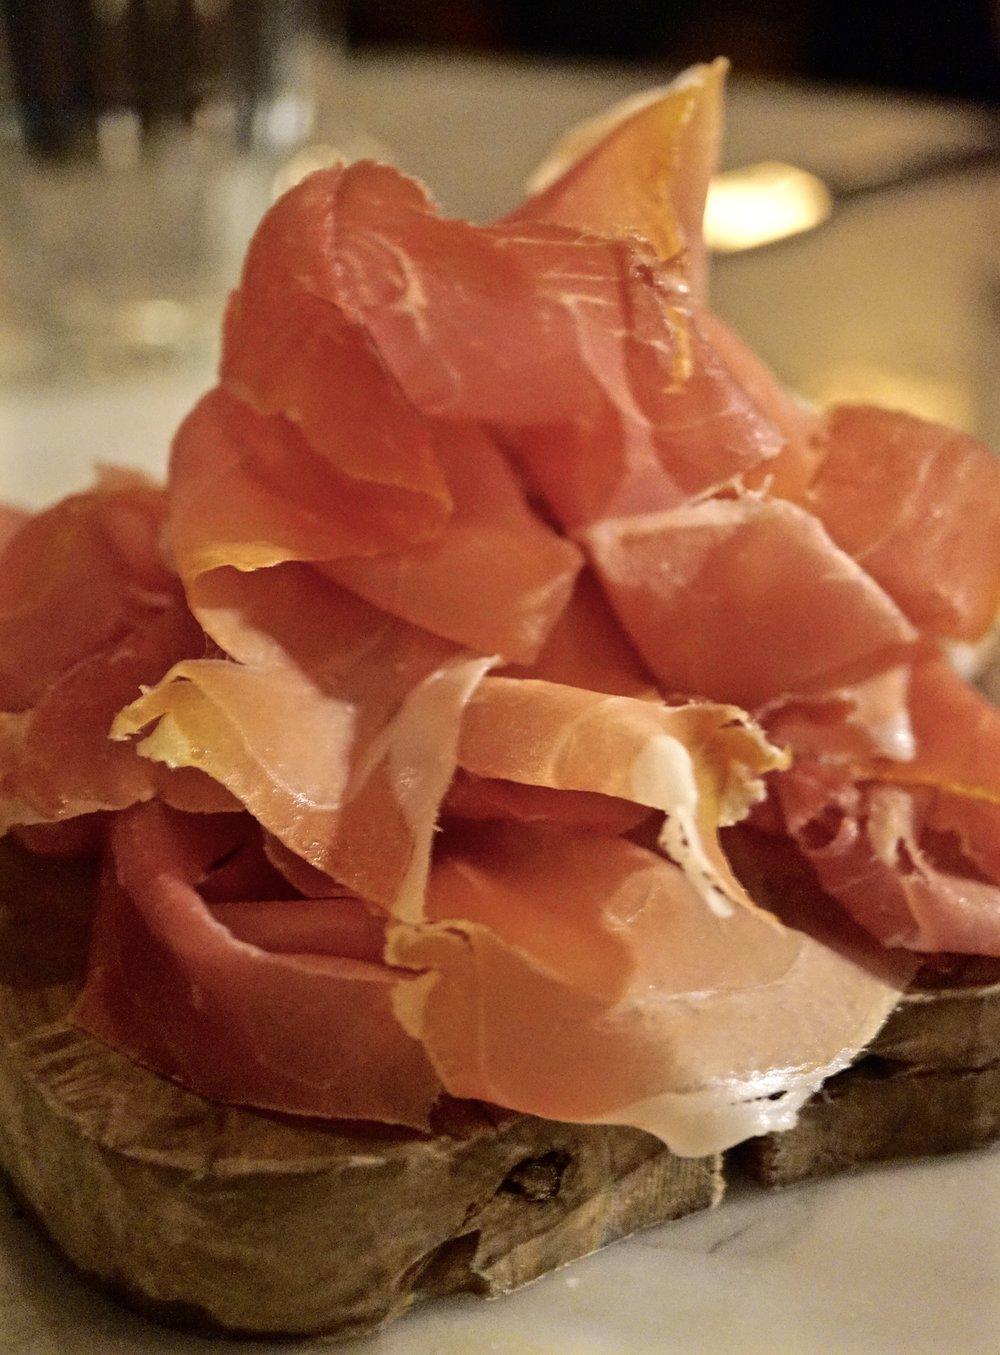 Parma Ham (aged 24 months)